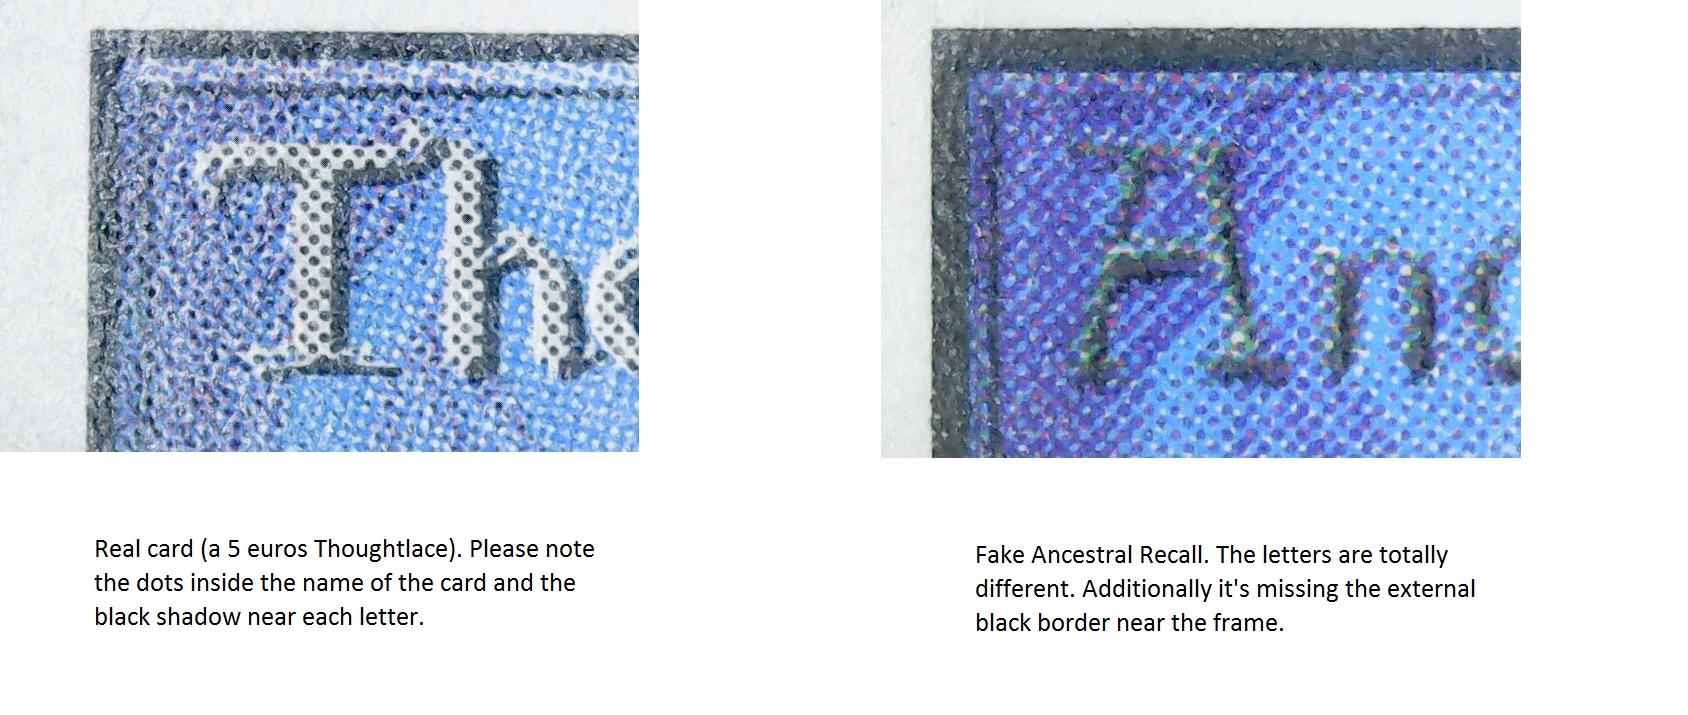 Counterfeit Ancestrall Recall